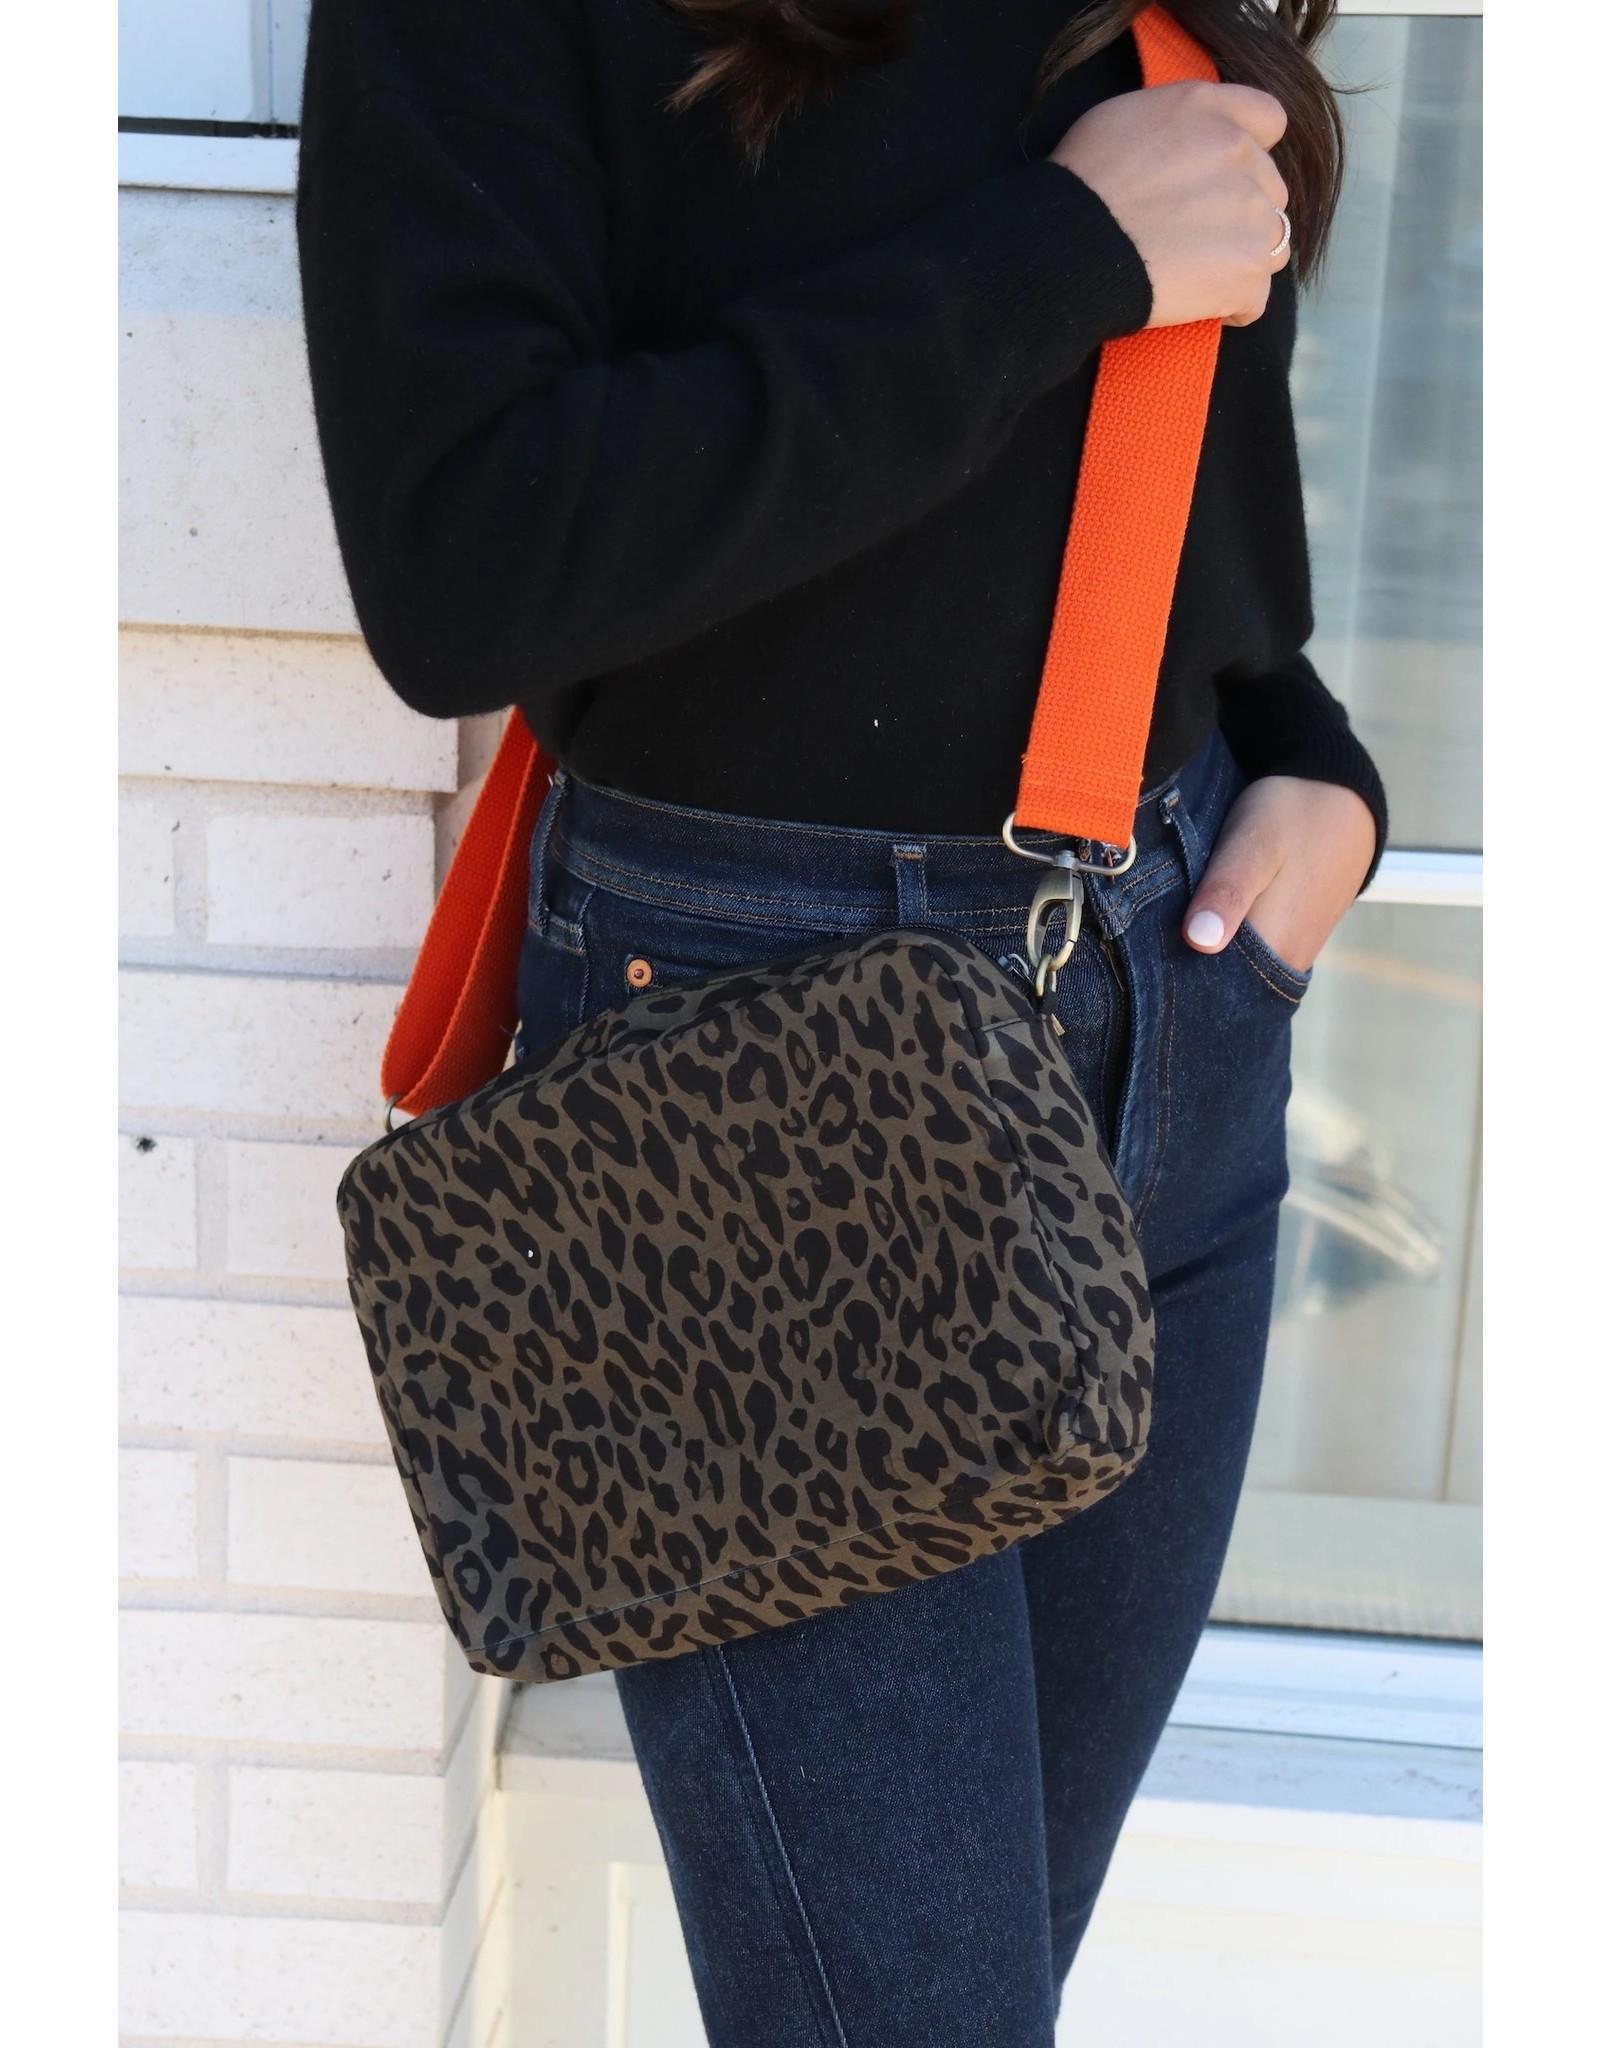 Panache Accessories Leopard Crossbody Bag